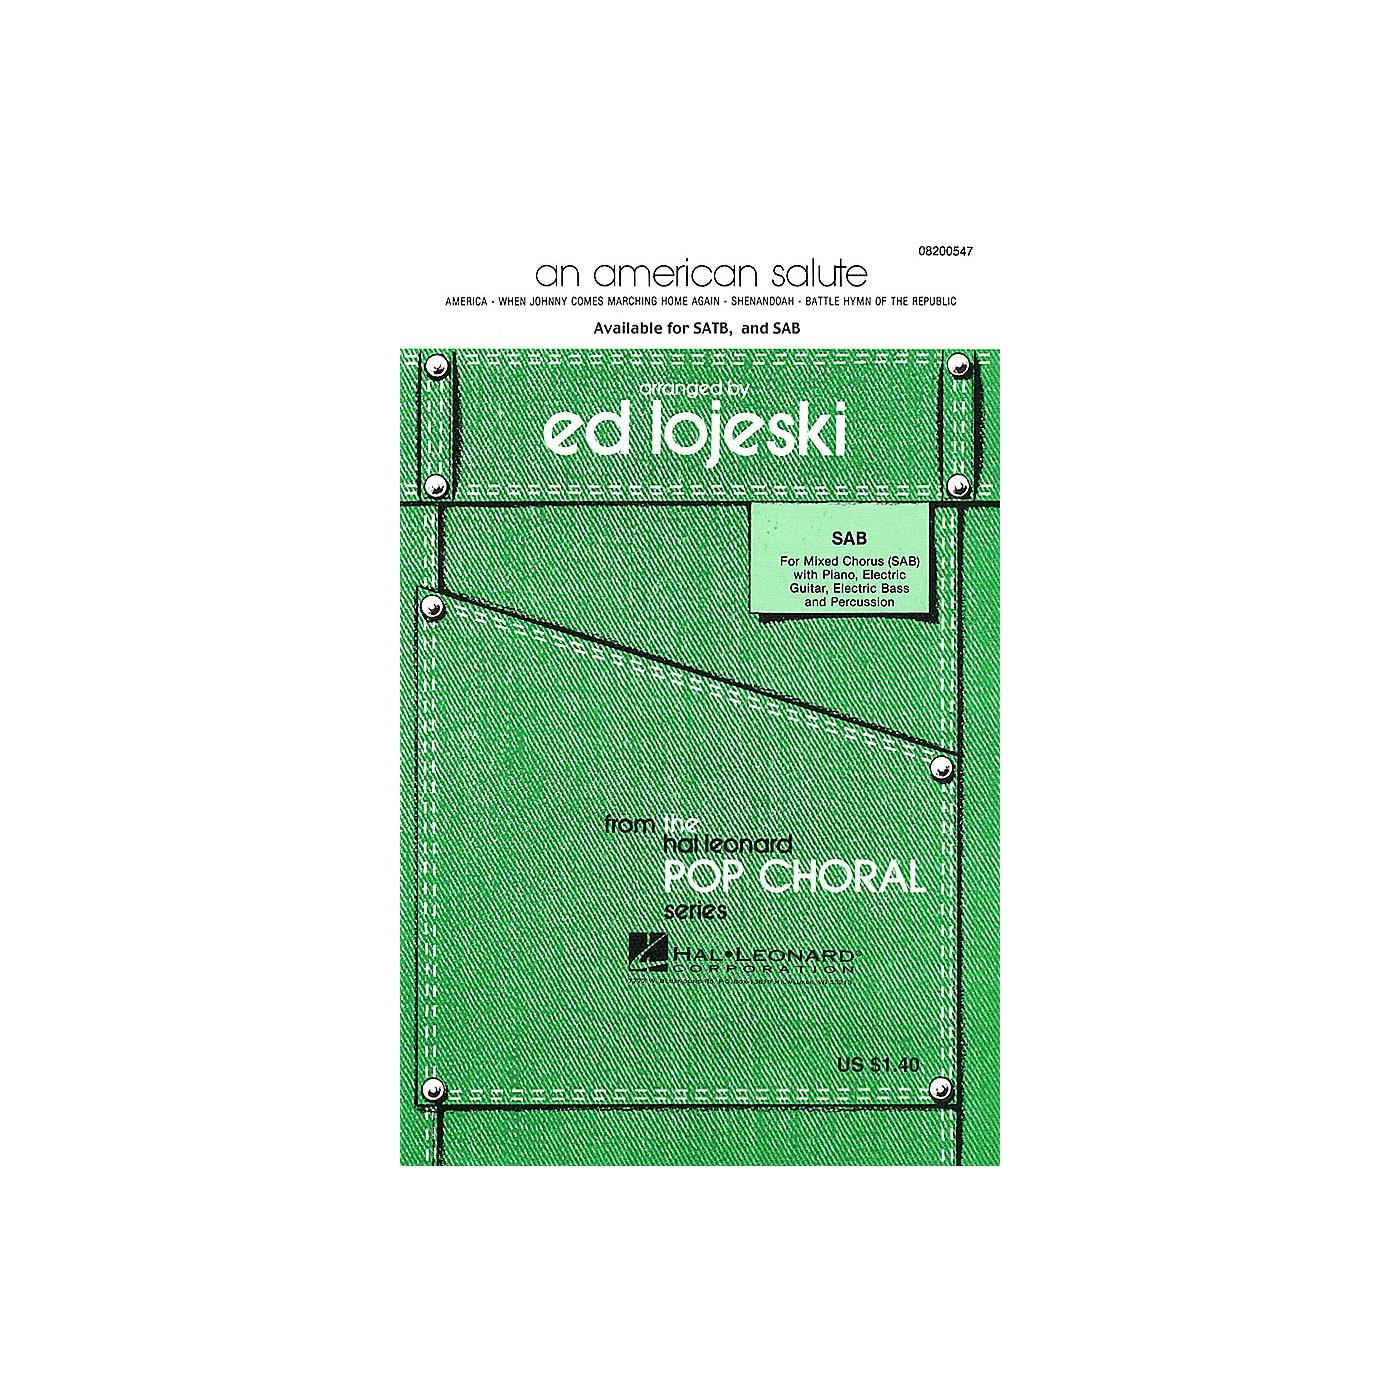 Hal Leonard An American Salute (Medley) (SATB) SATB Arranged by Ed Lojeski thumbnail